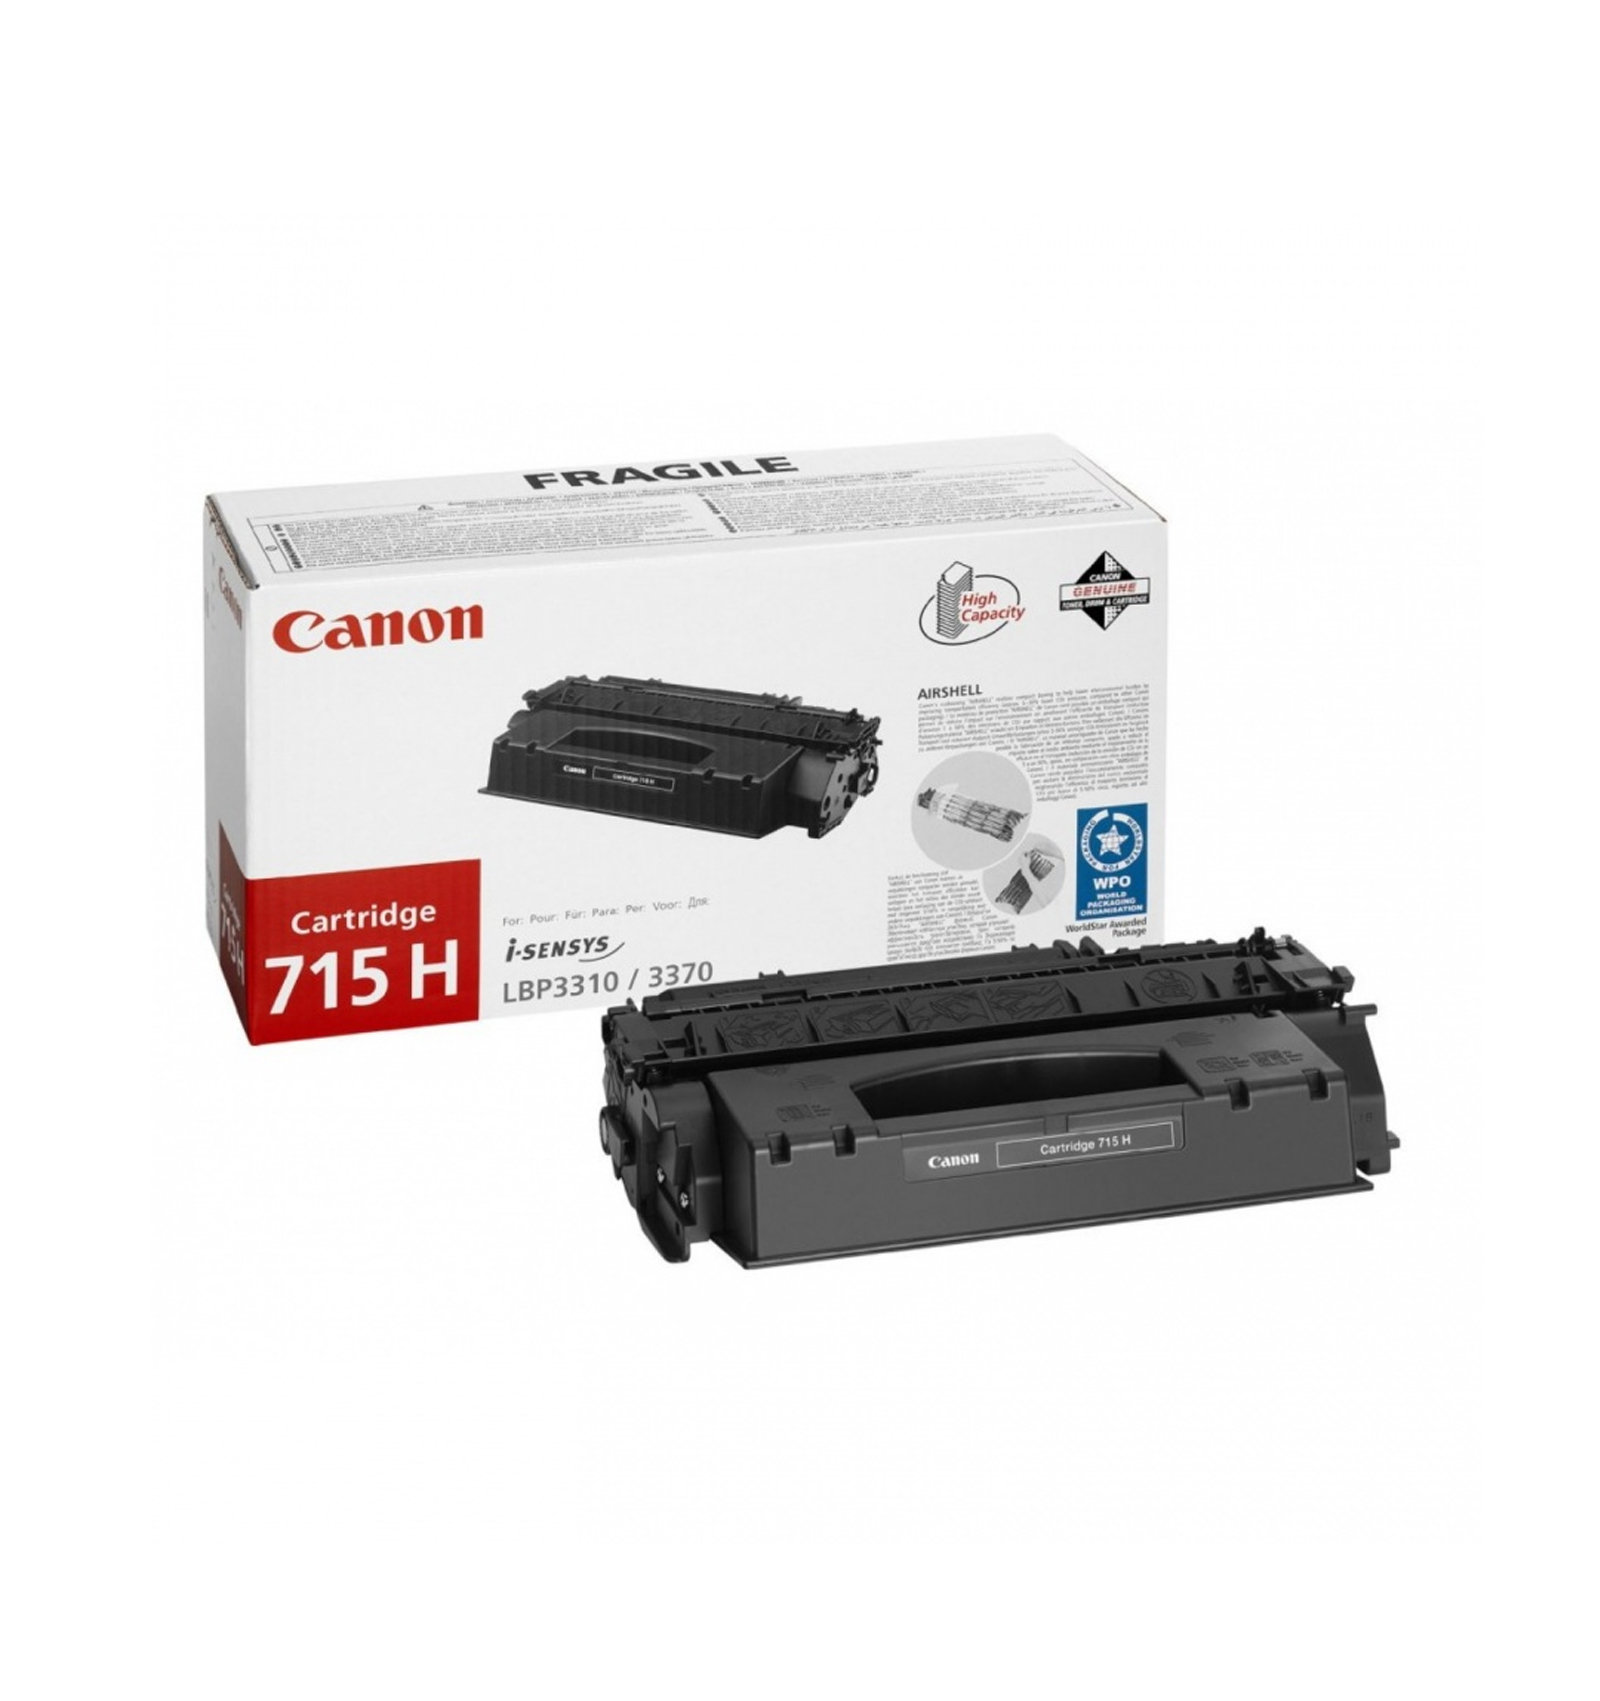 Заправка тонером картриджа Сanon 715h Canon LBP 3310, LBP 3370